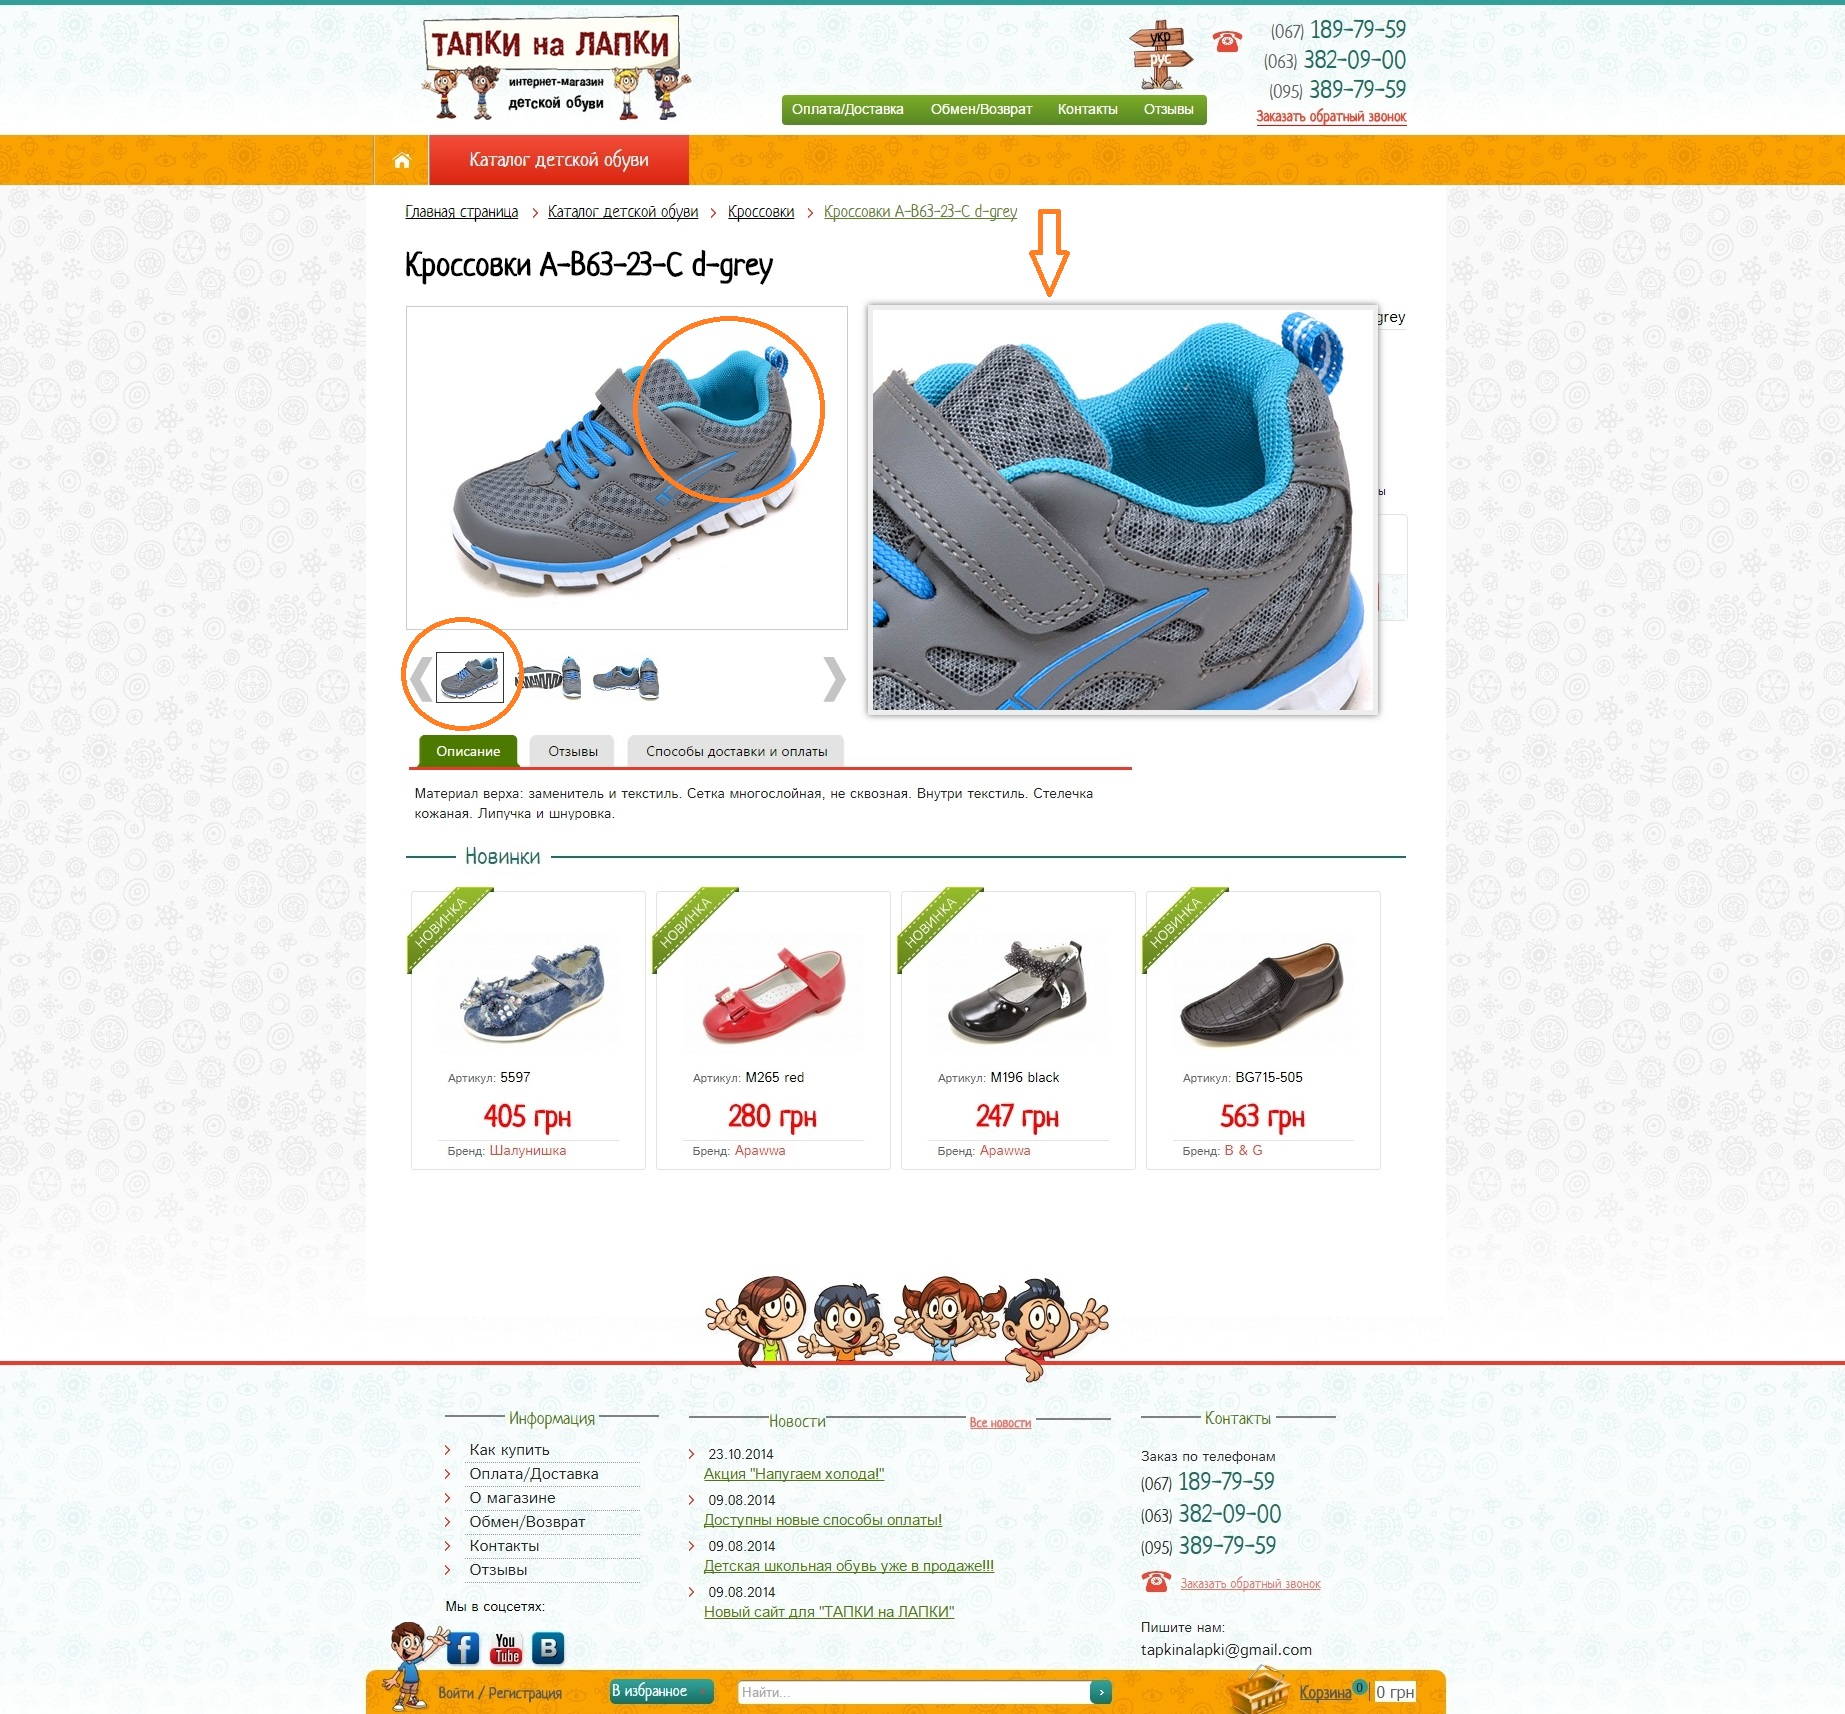 Интернет-магазин обуви для малышей «ТАПКИ НА ЛАПКИ» 7cae95ccd25